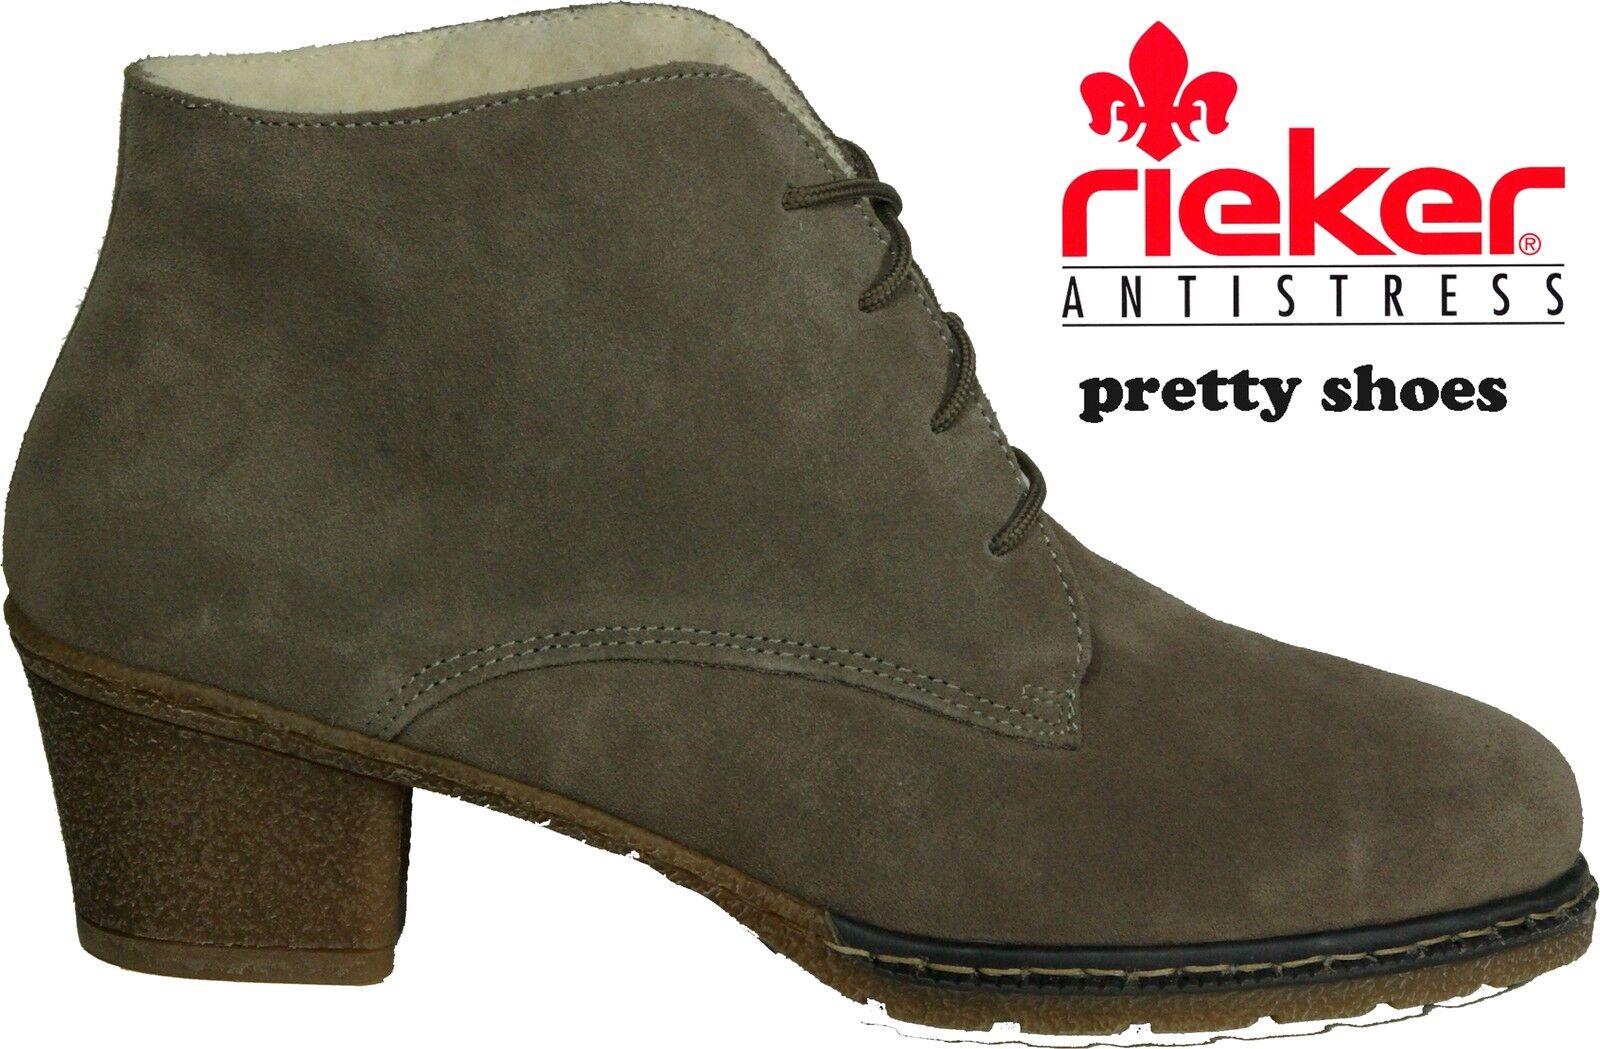 Rieker de botín talla 40 gris caliente forro de piel de Rieker cordero modelo Natalie nuevo af506d